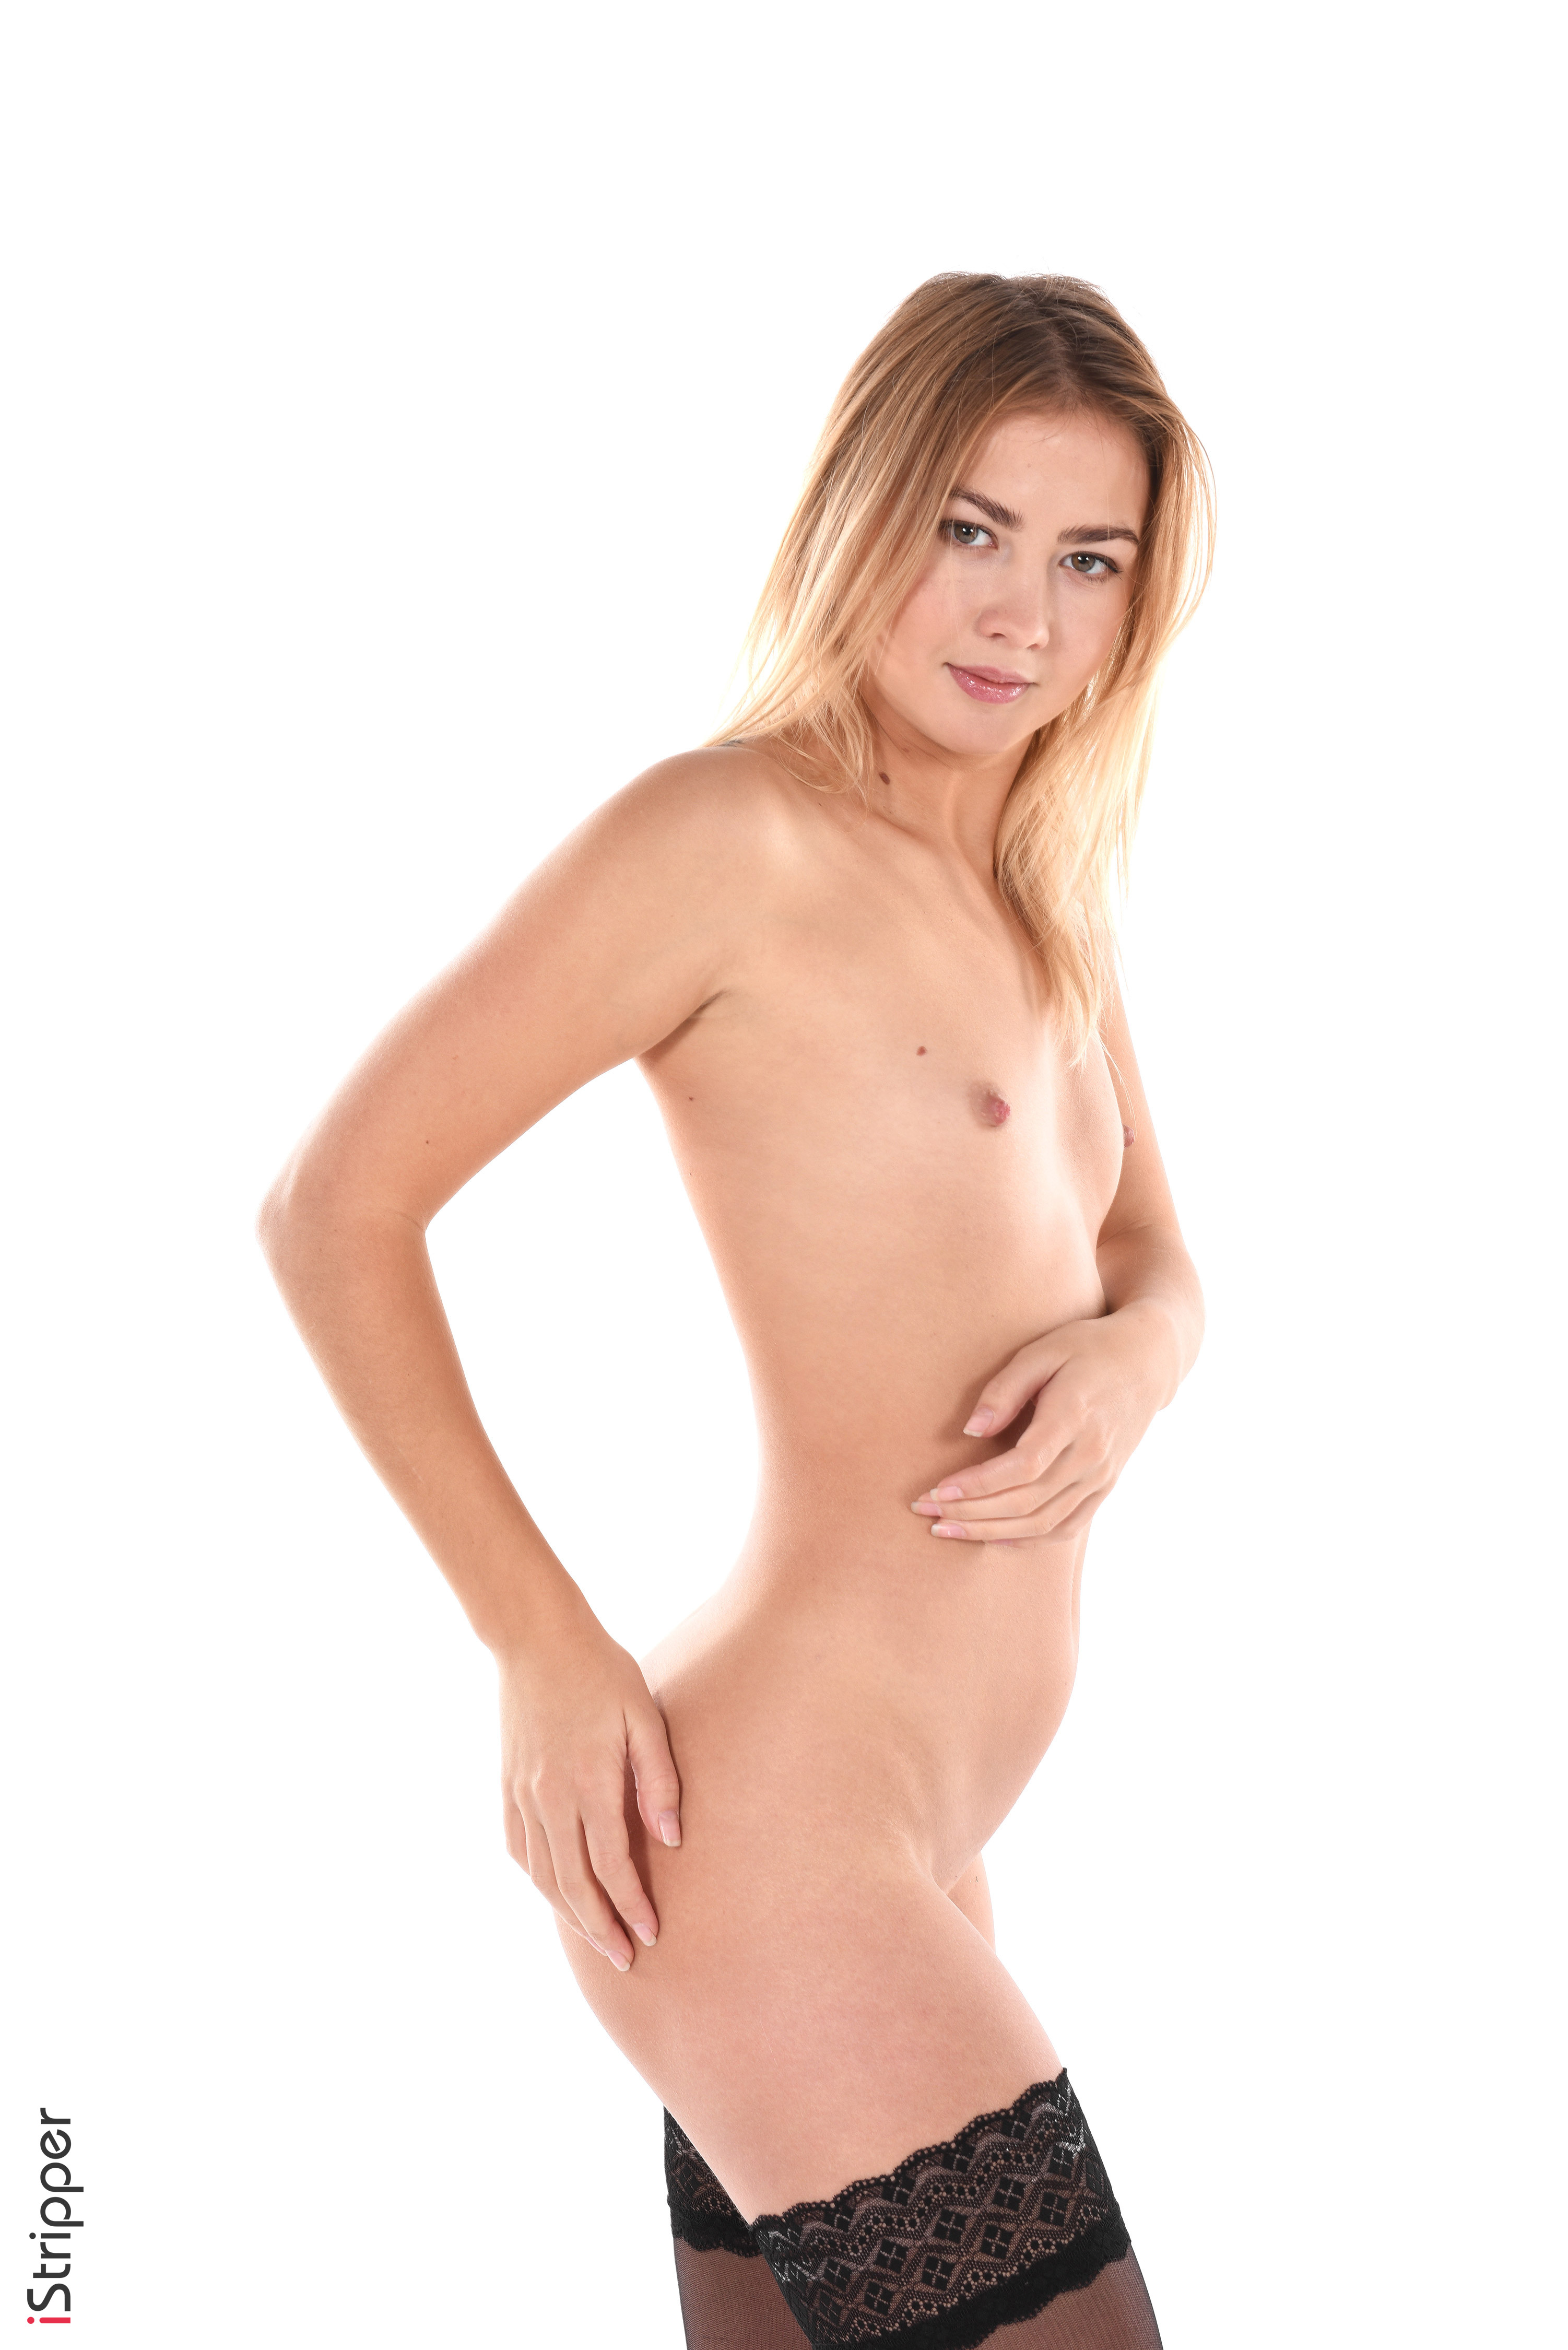 sexy girl striptease pornhub